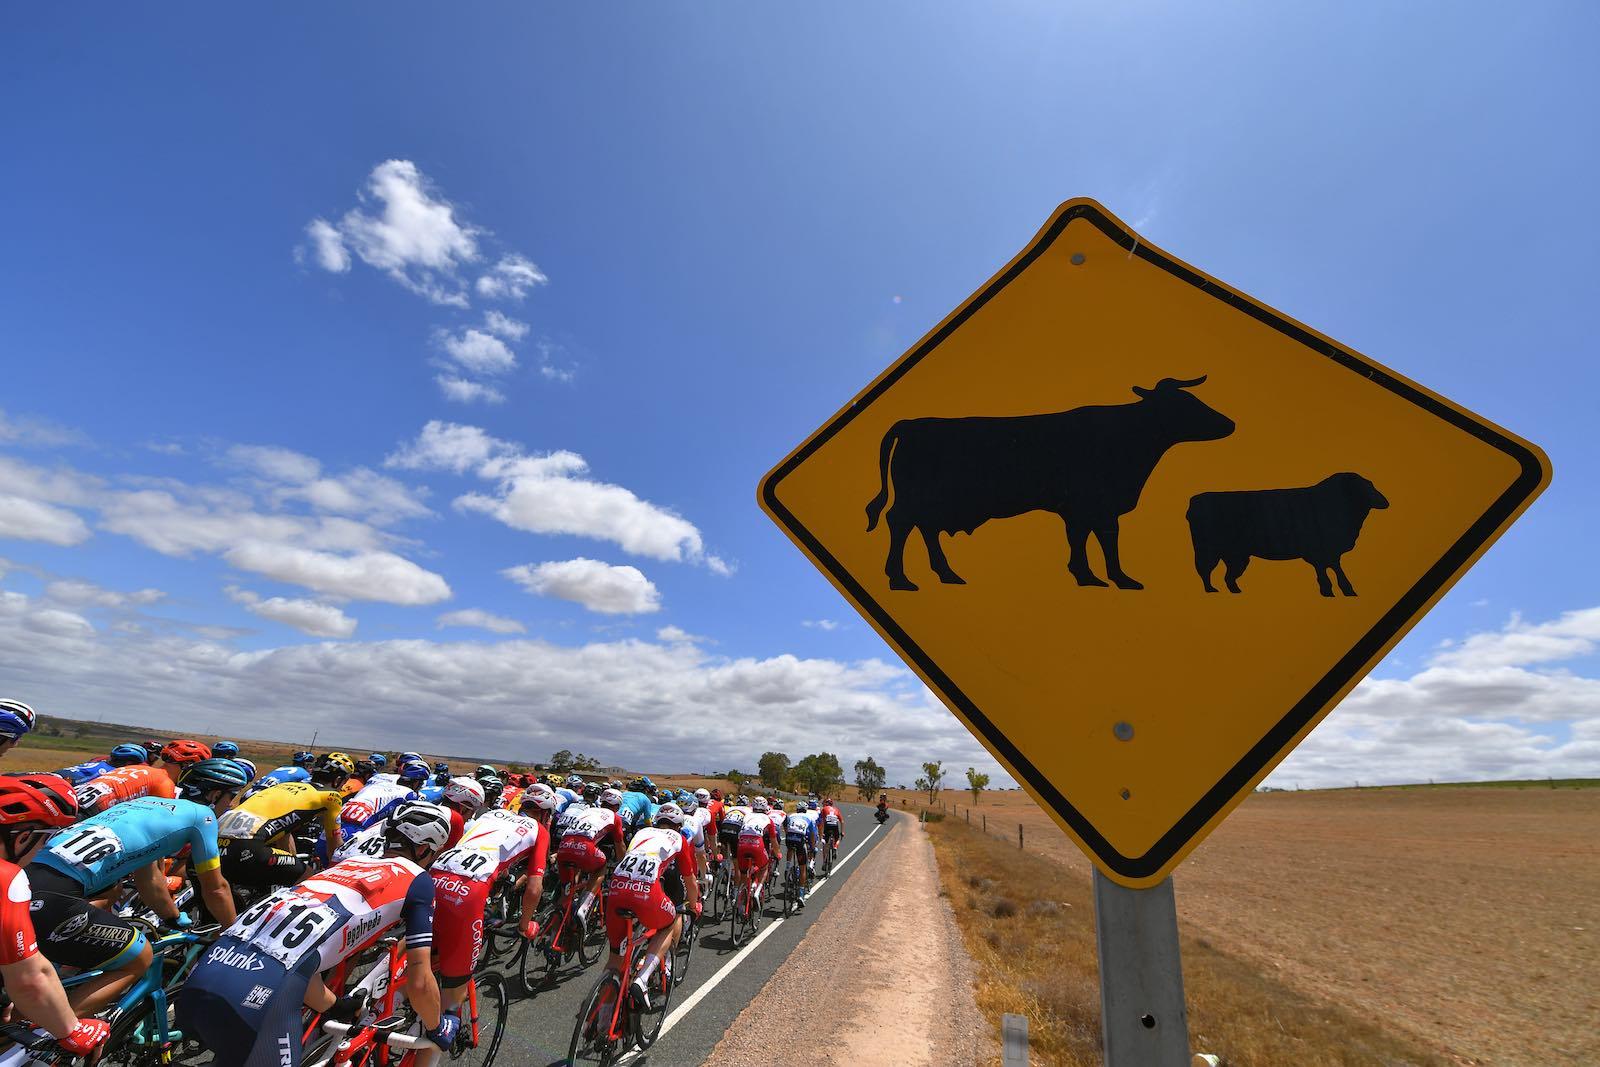 Not so fast (Tim de Waele/Getty Images)